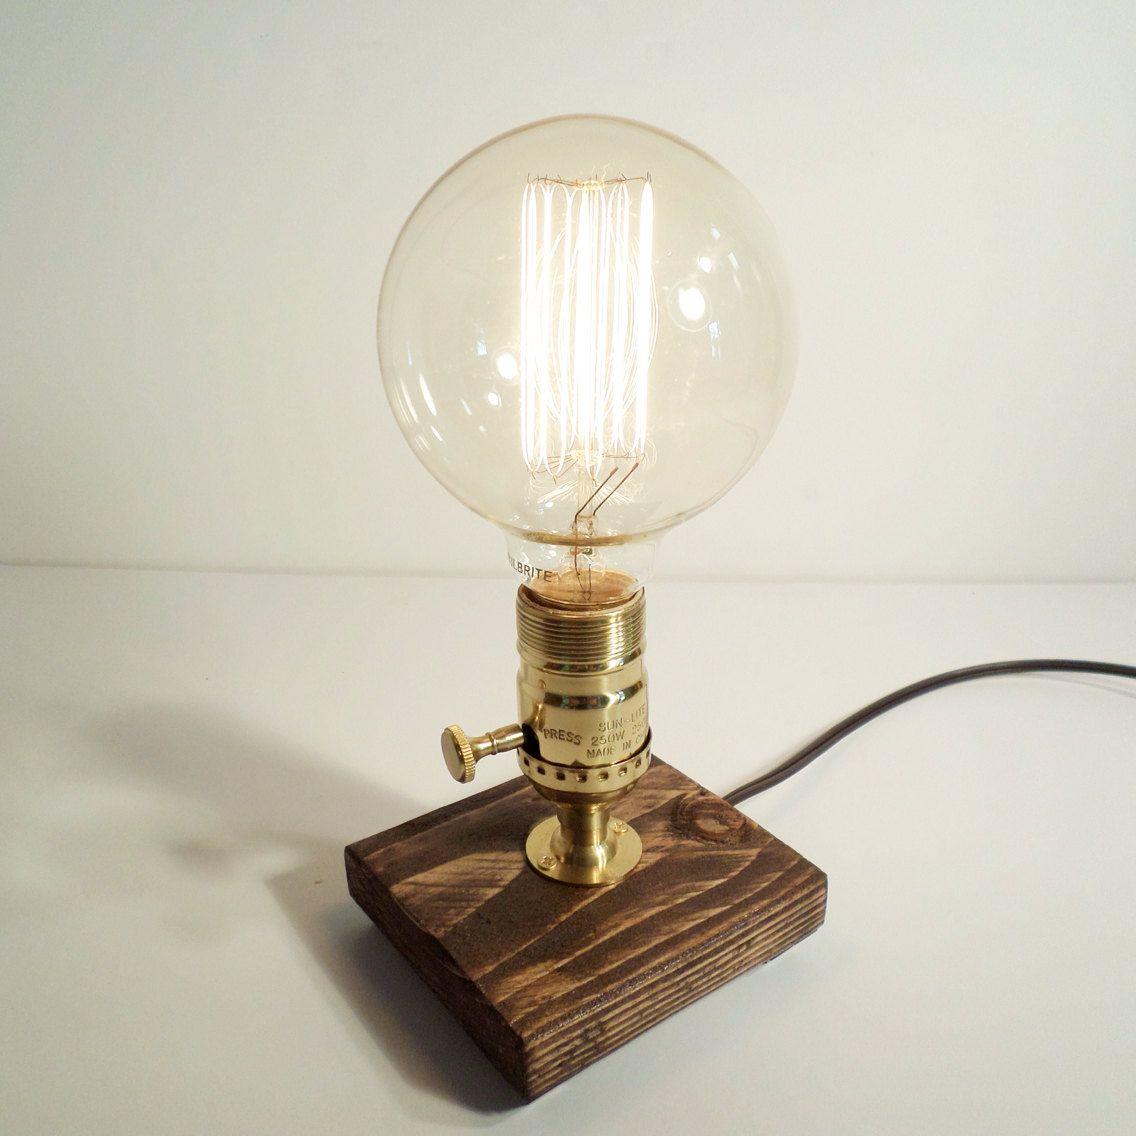 Table lamp vintage style - Industrial Lamp Steampunk Lamp Table Lamp Edison Lamp Vintage Light Pipe Lamp Bedside Lamp Rustic Lighting Loft